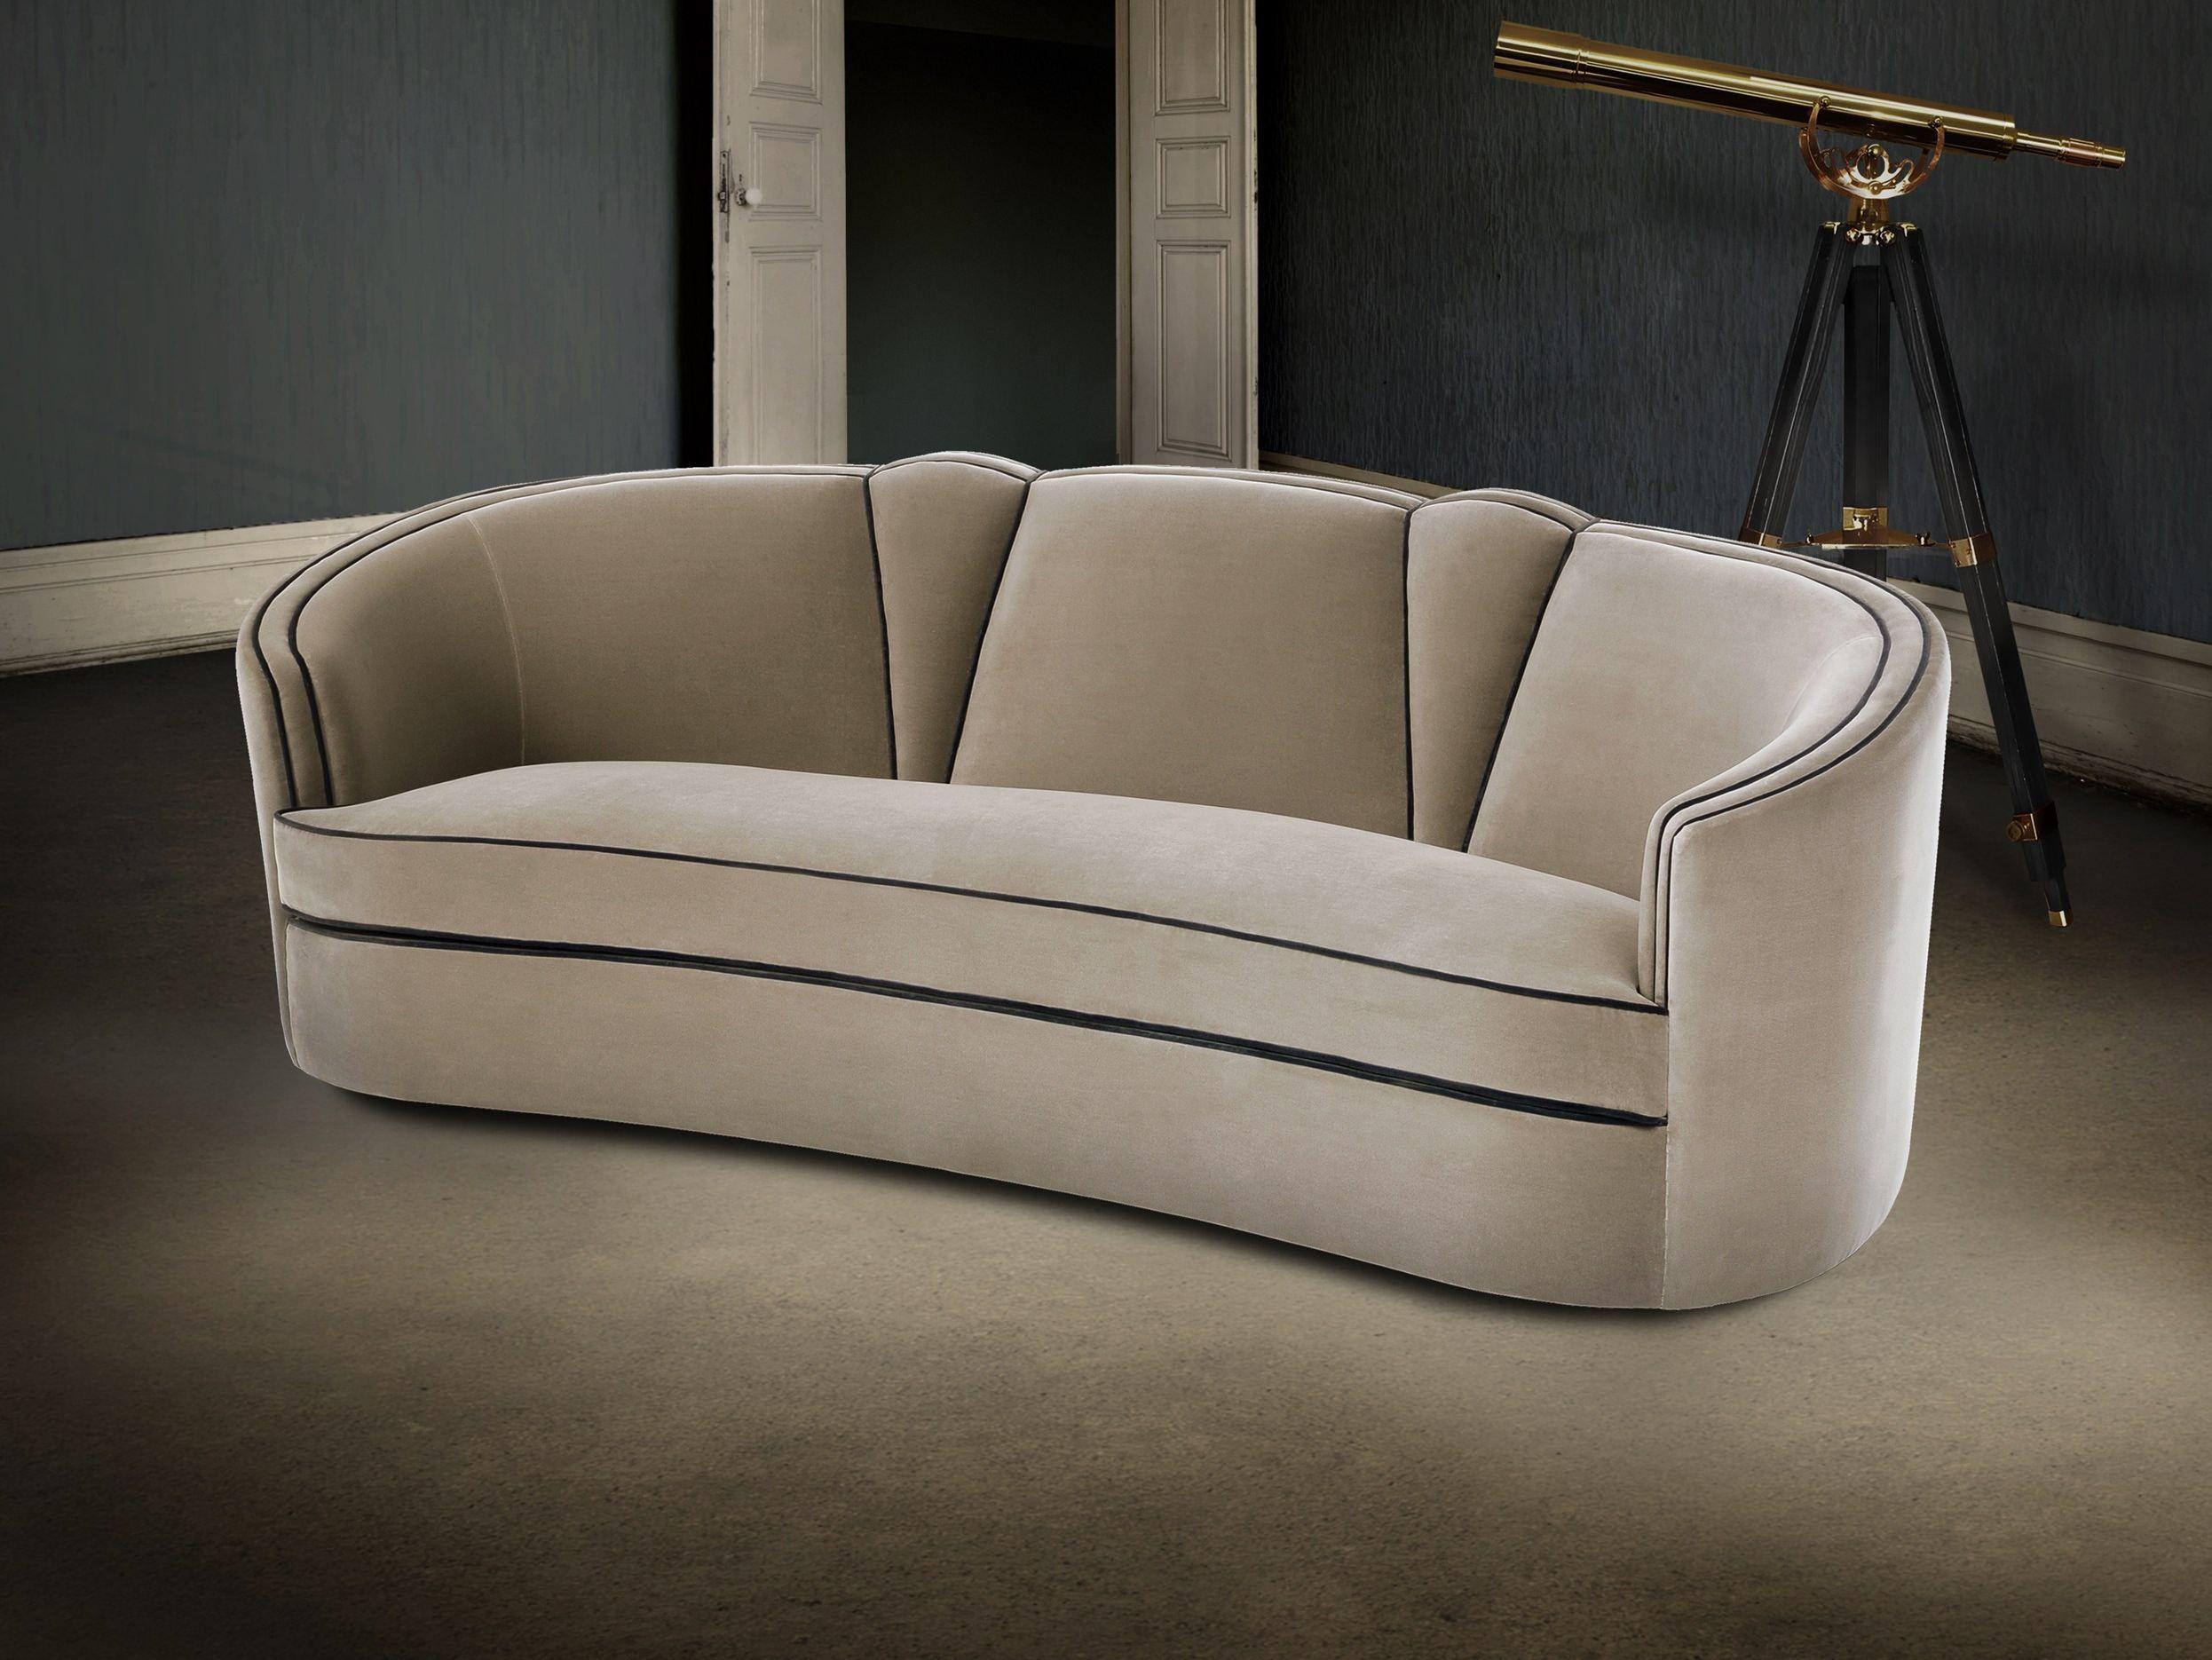 munna furniture in edmonton Google Search